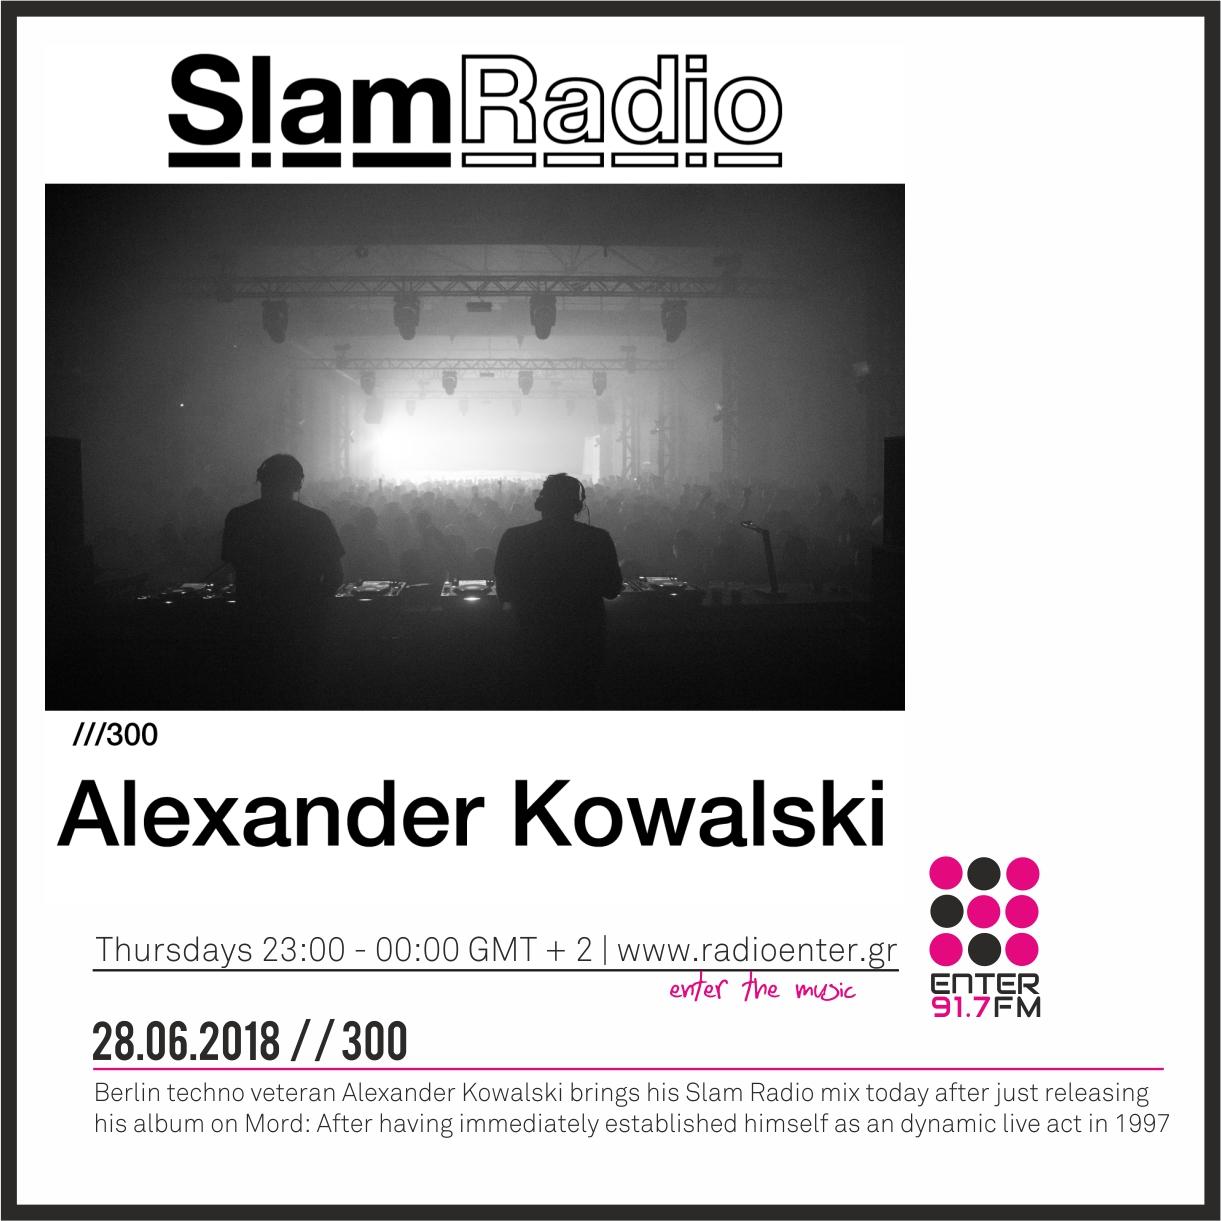 2018.06.28 - Slam Radio 300